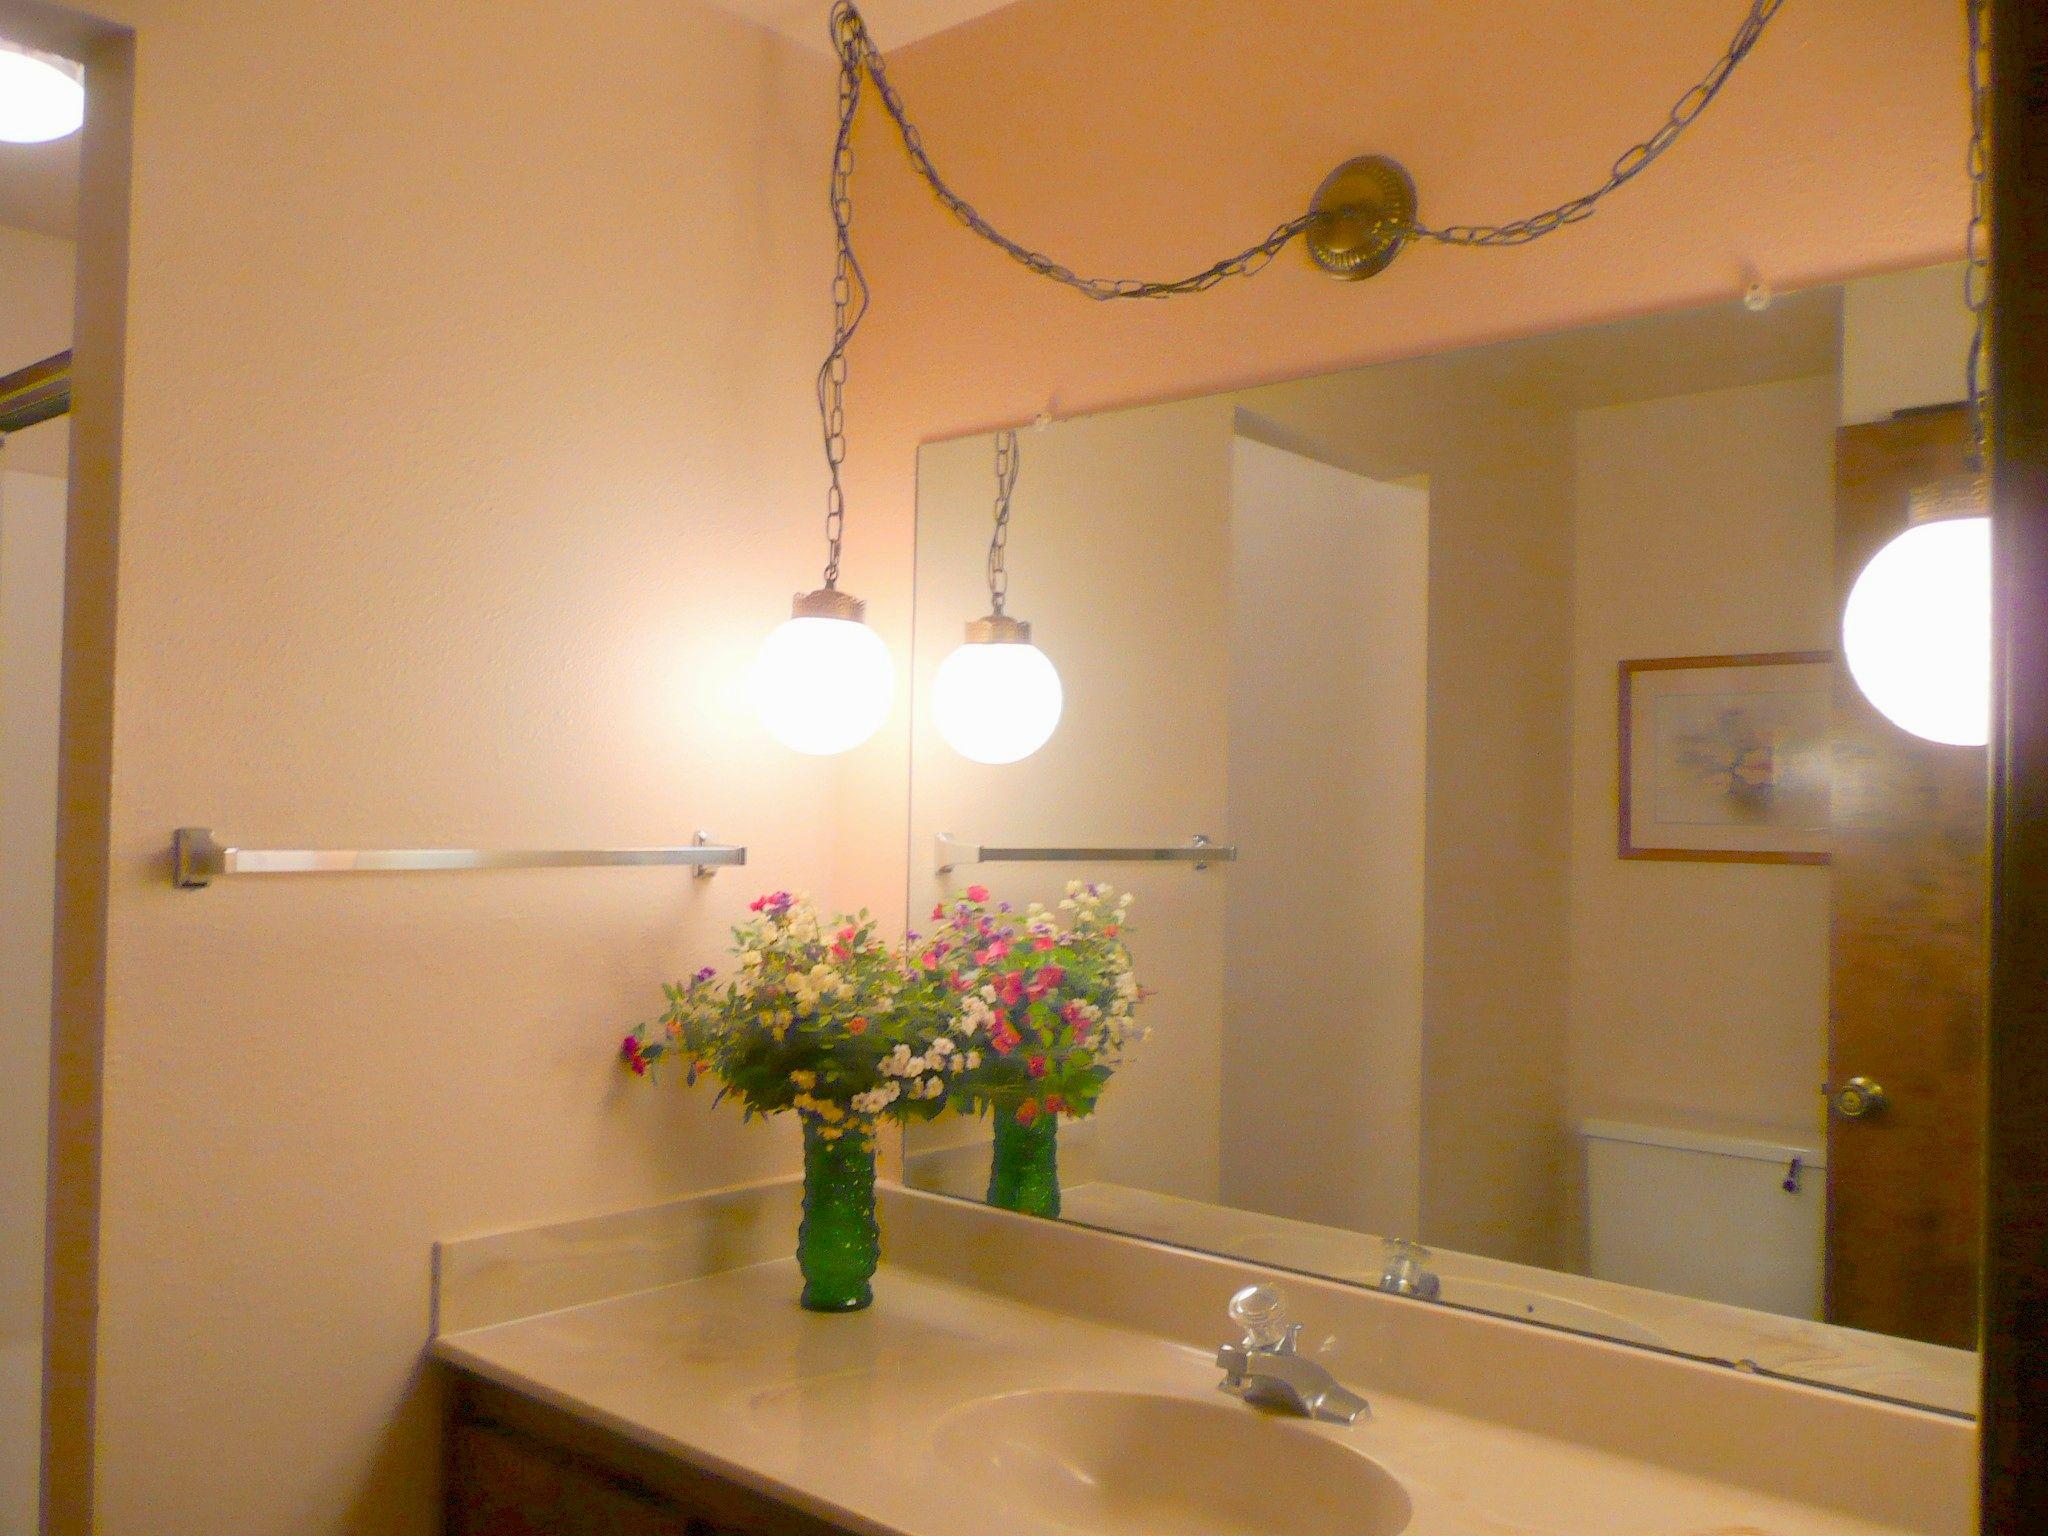 lovely walmart bathroom vanity picture-Amazing Walmart Bathroom Vanity Layout